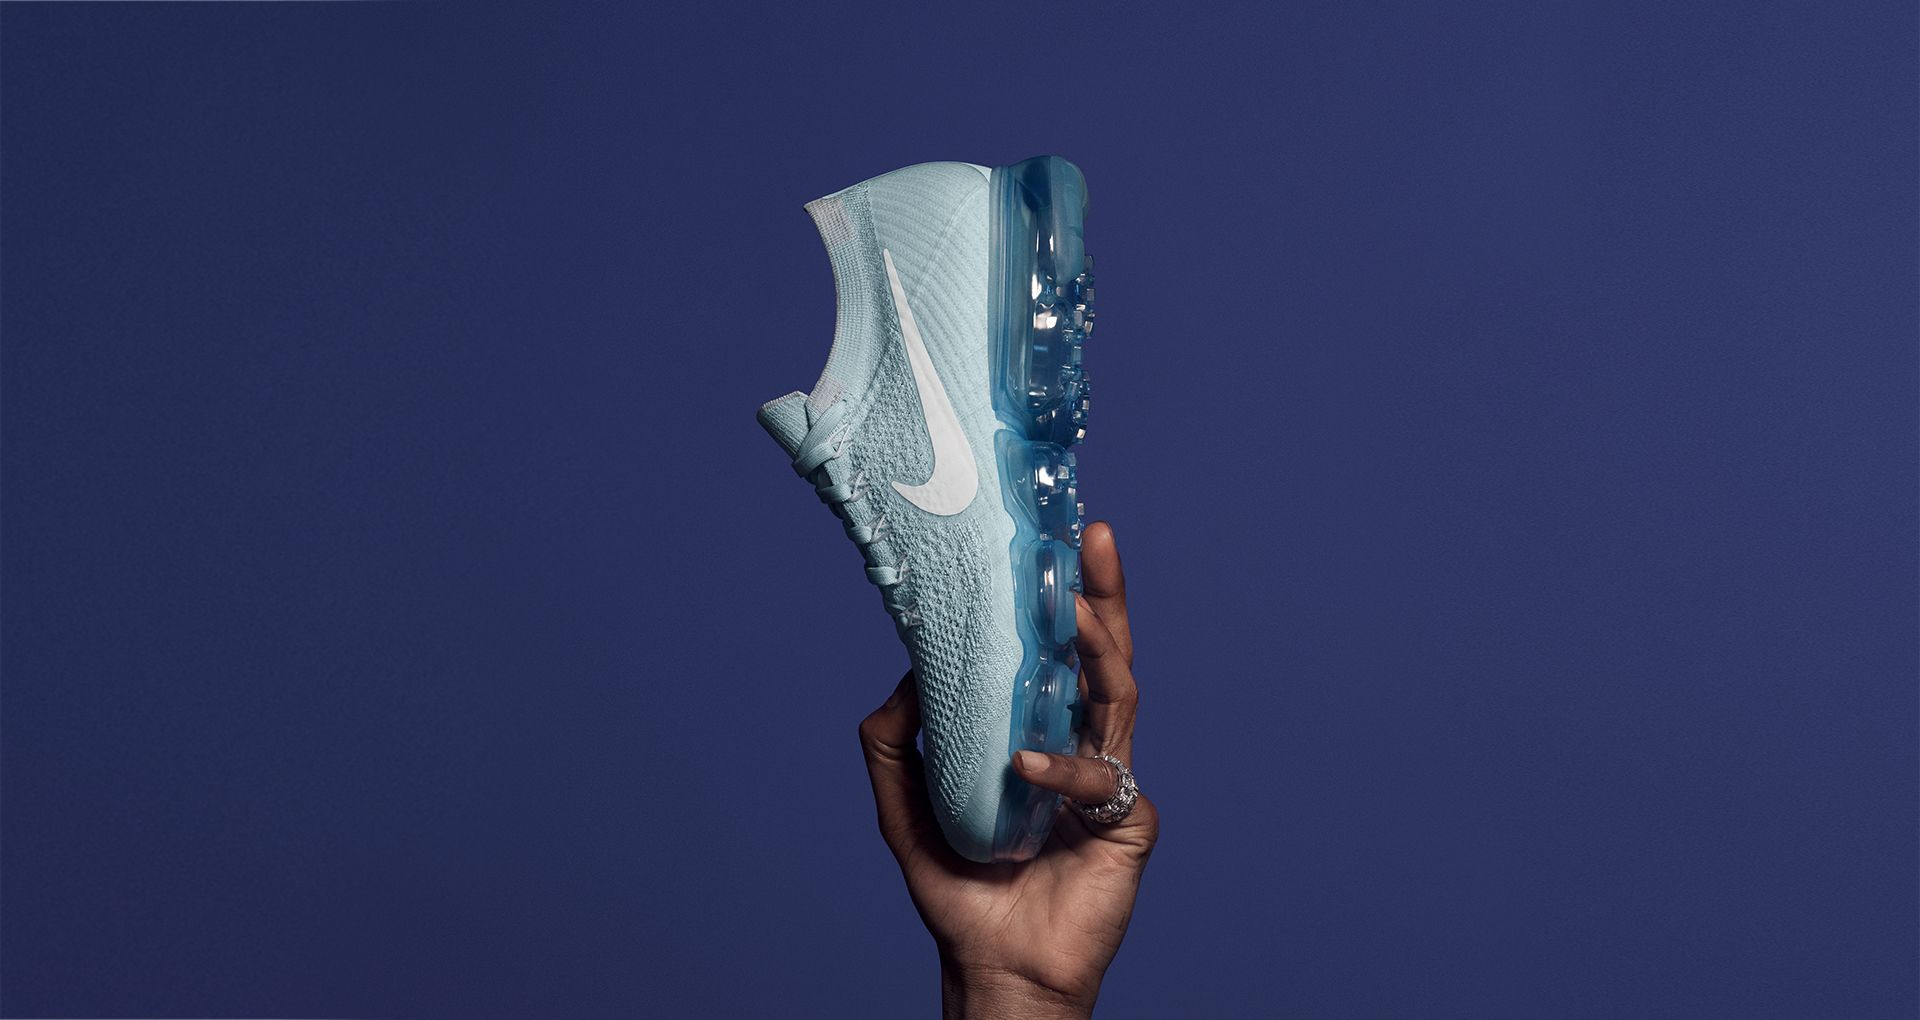 3709e3570e558 Nike Air VaporMax Flyknit Day to Night 'Glacier Blue'. Nike+ Launch SI